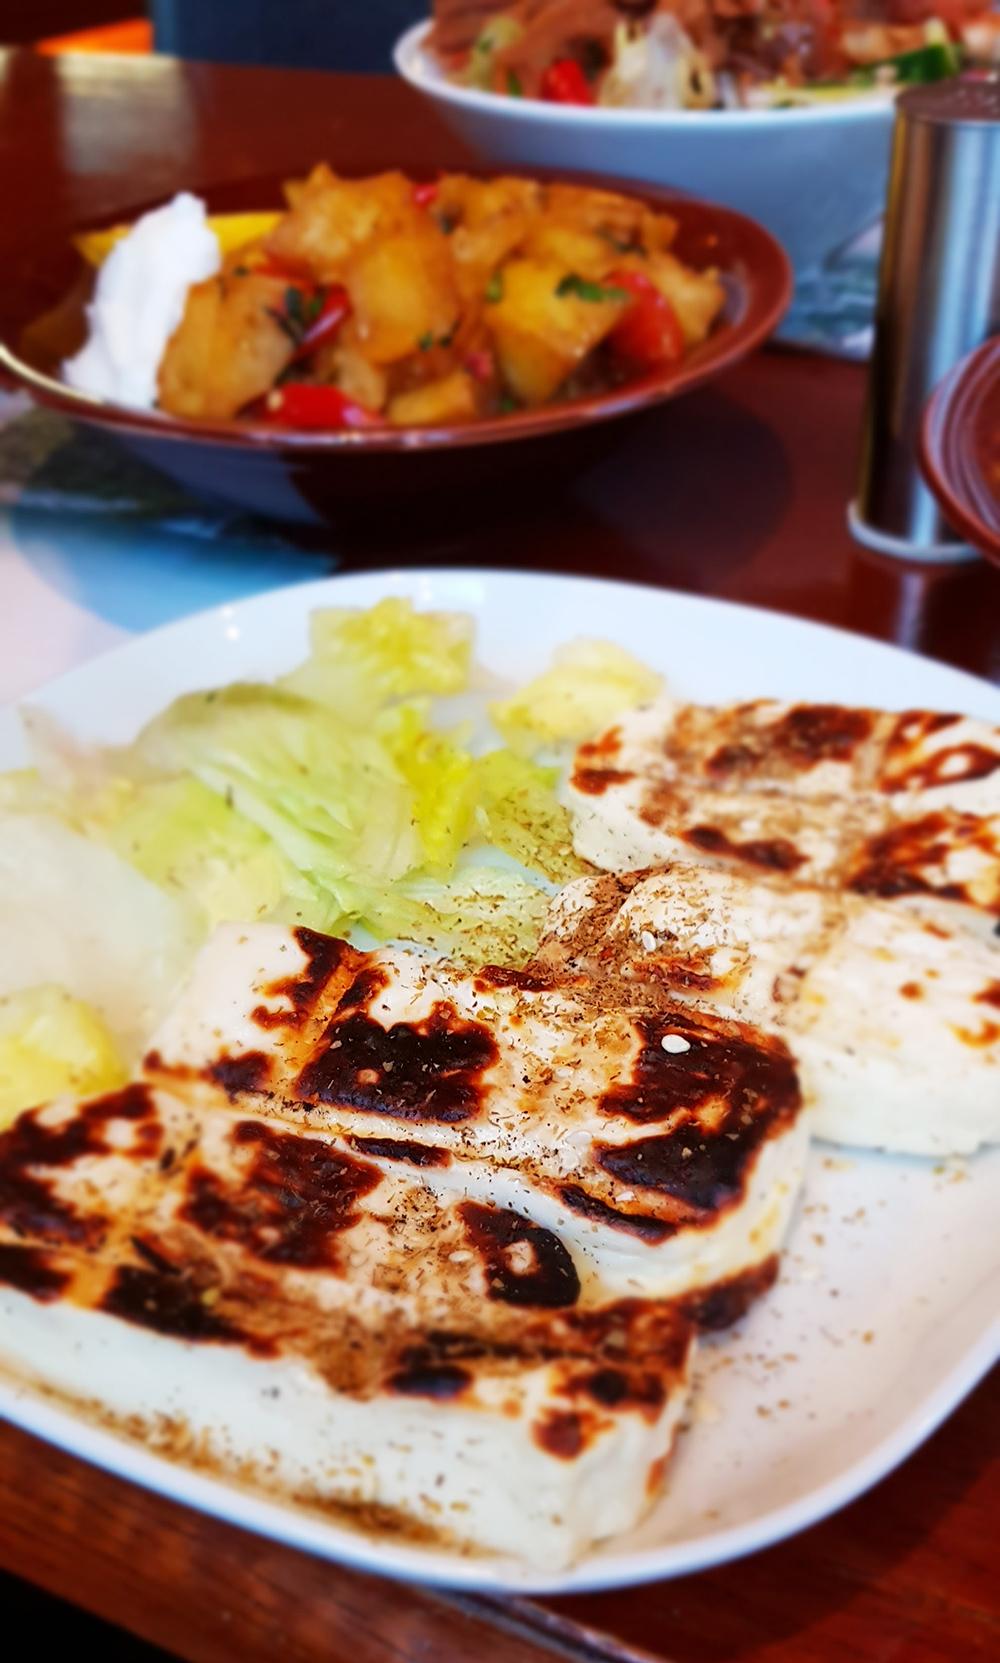 beirut-star-lebanese-food-4